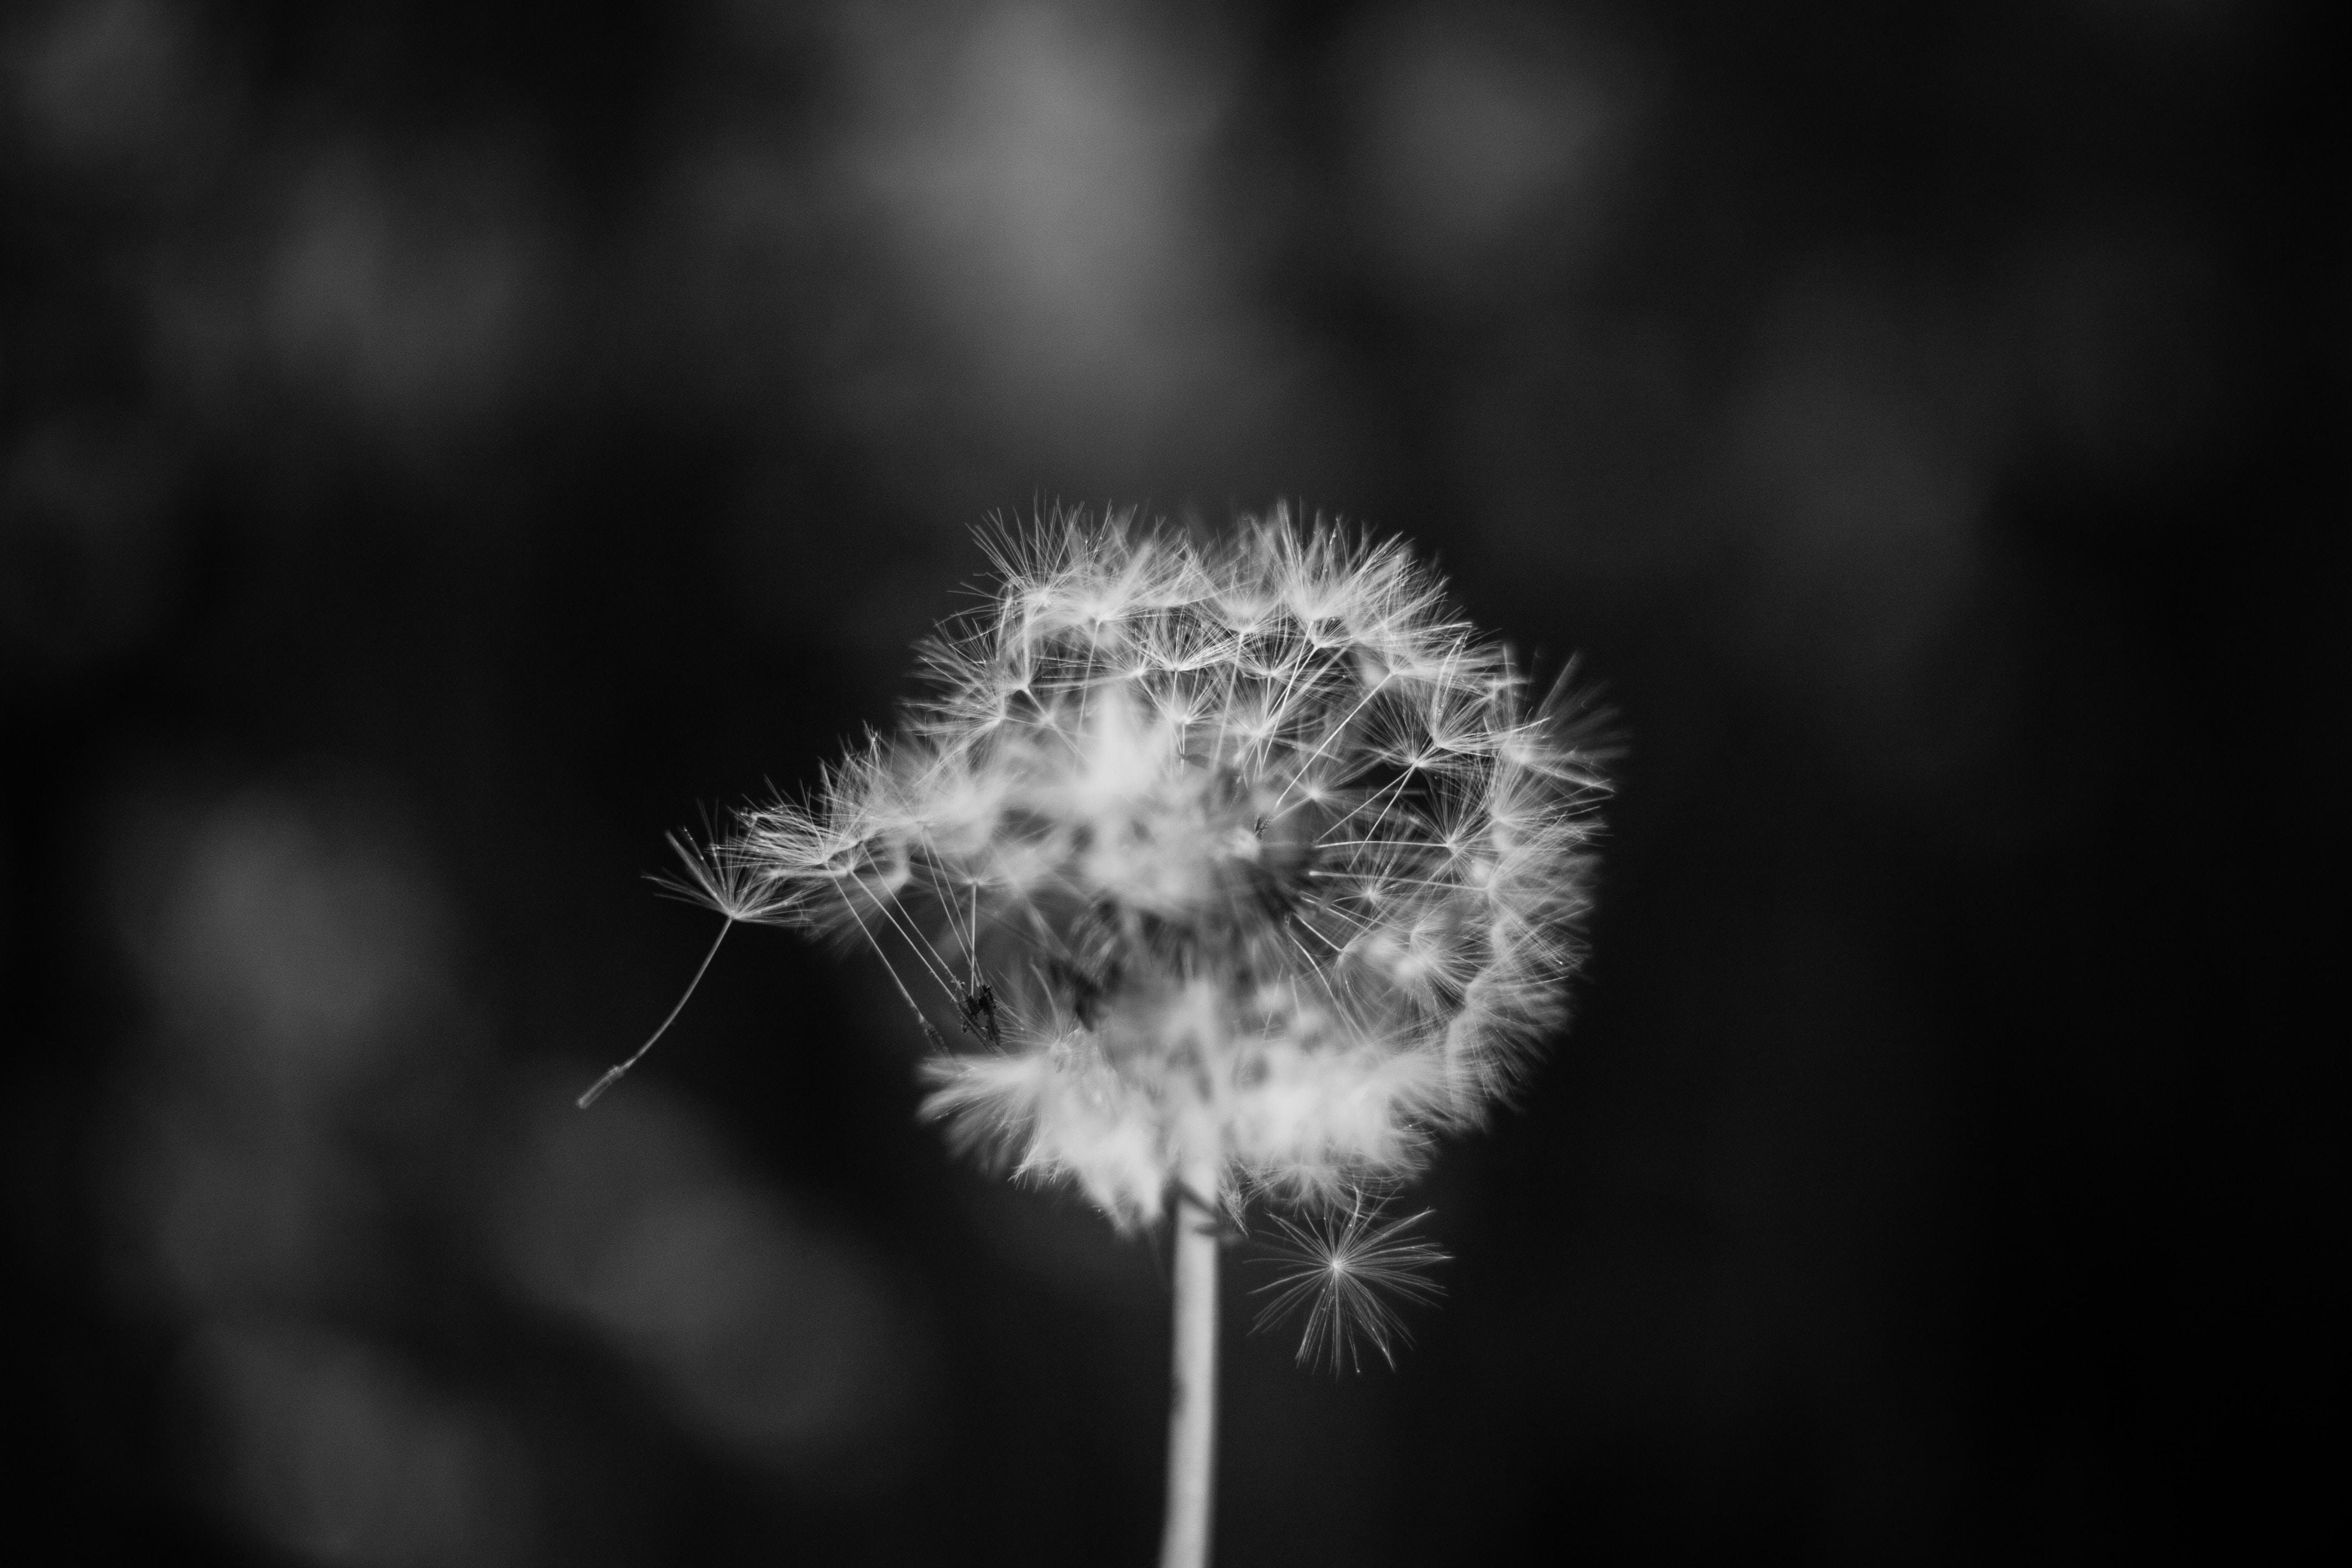 Black and white macro of dandelion flower head